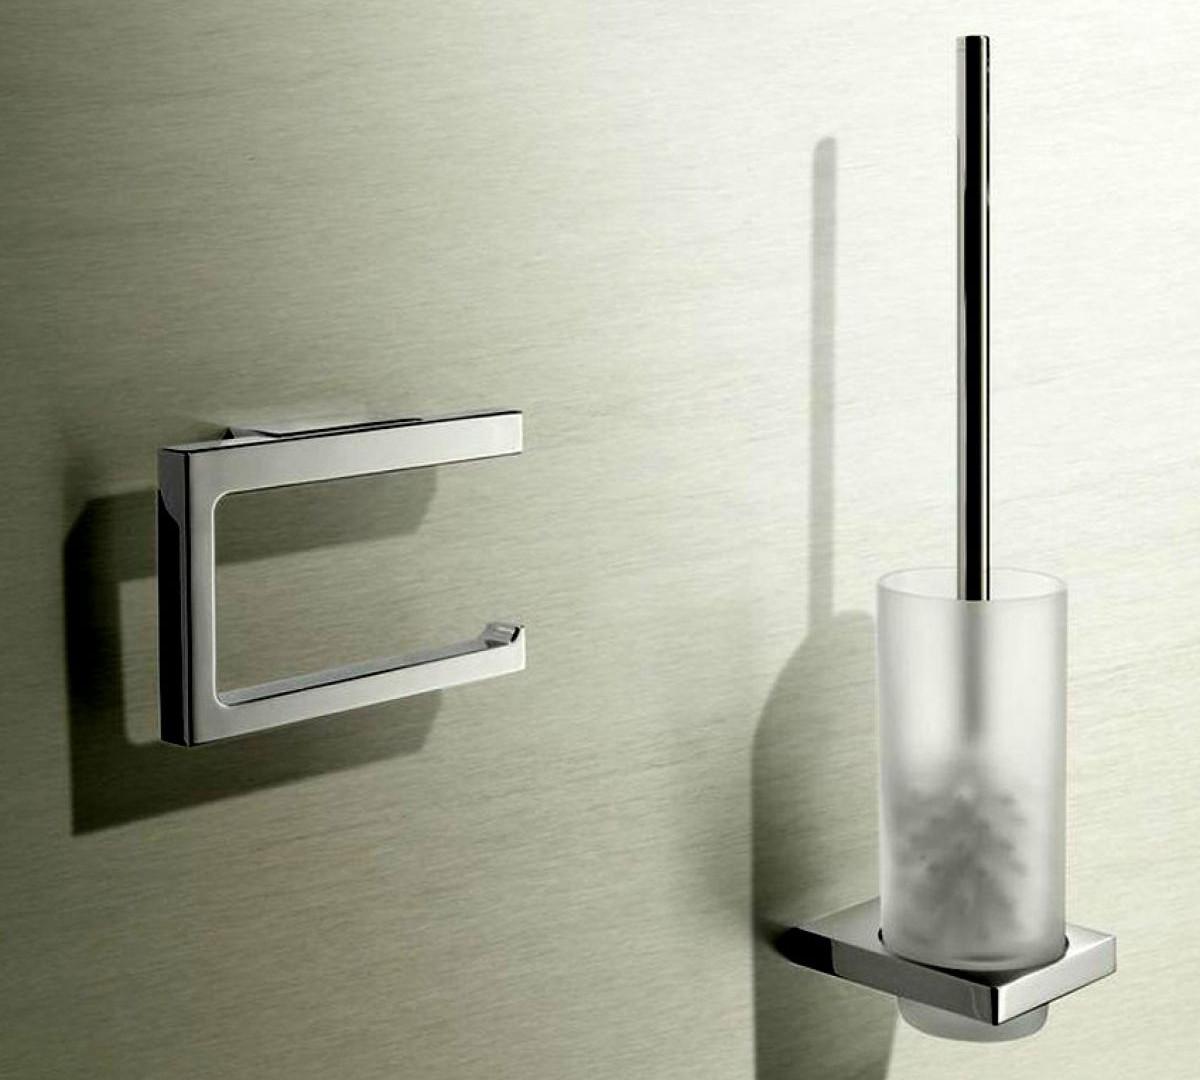 Keuco Bathroom Accessories